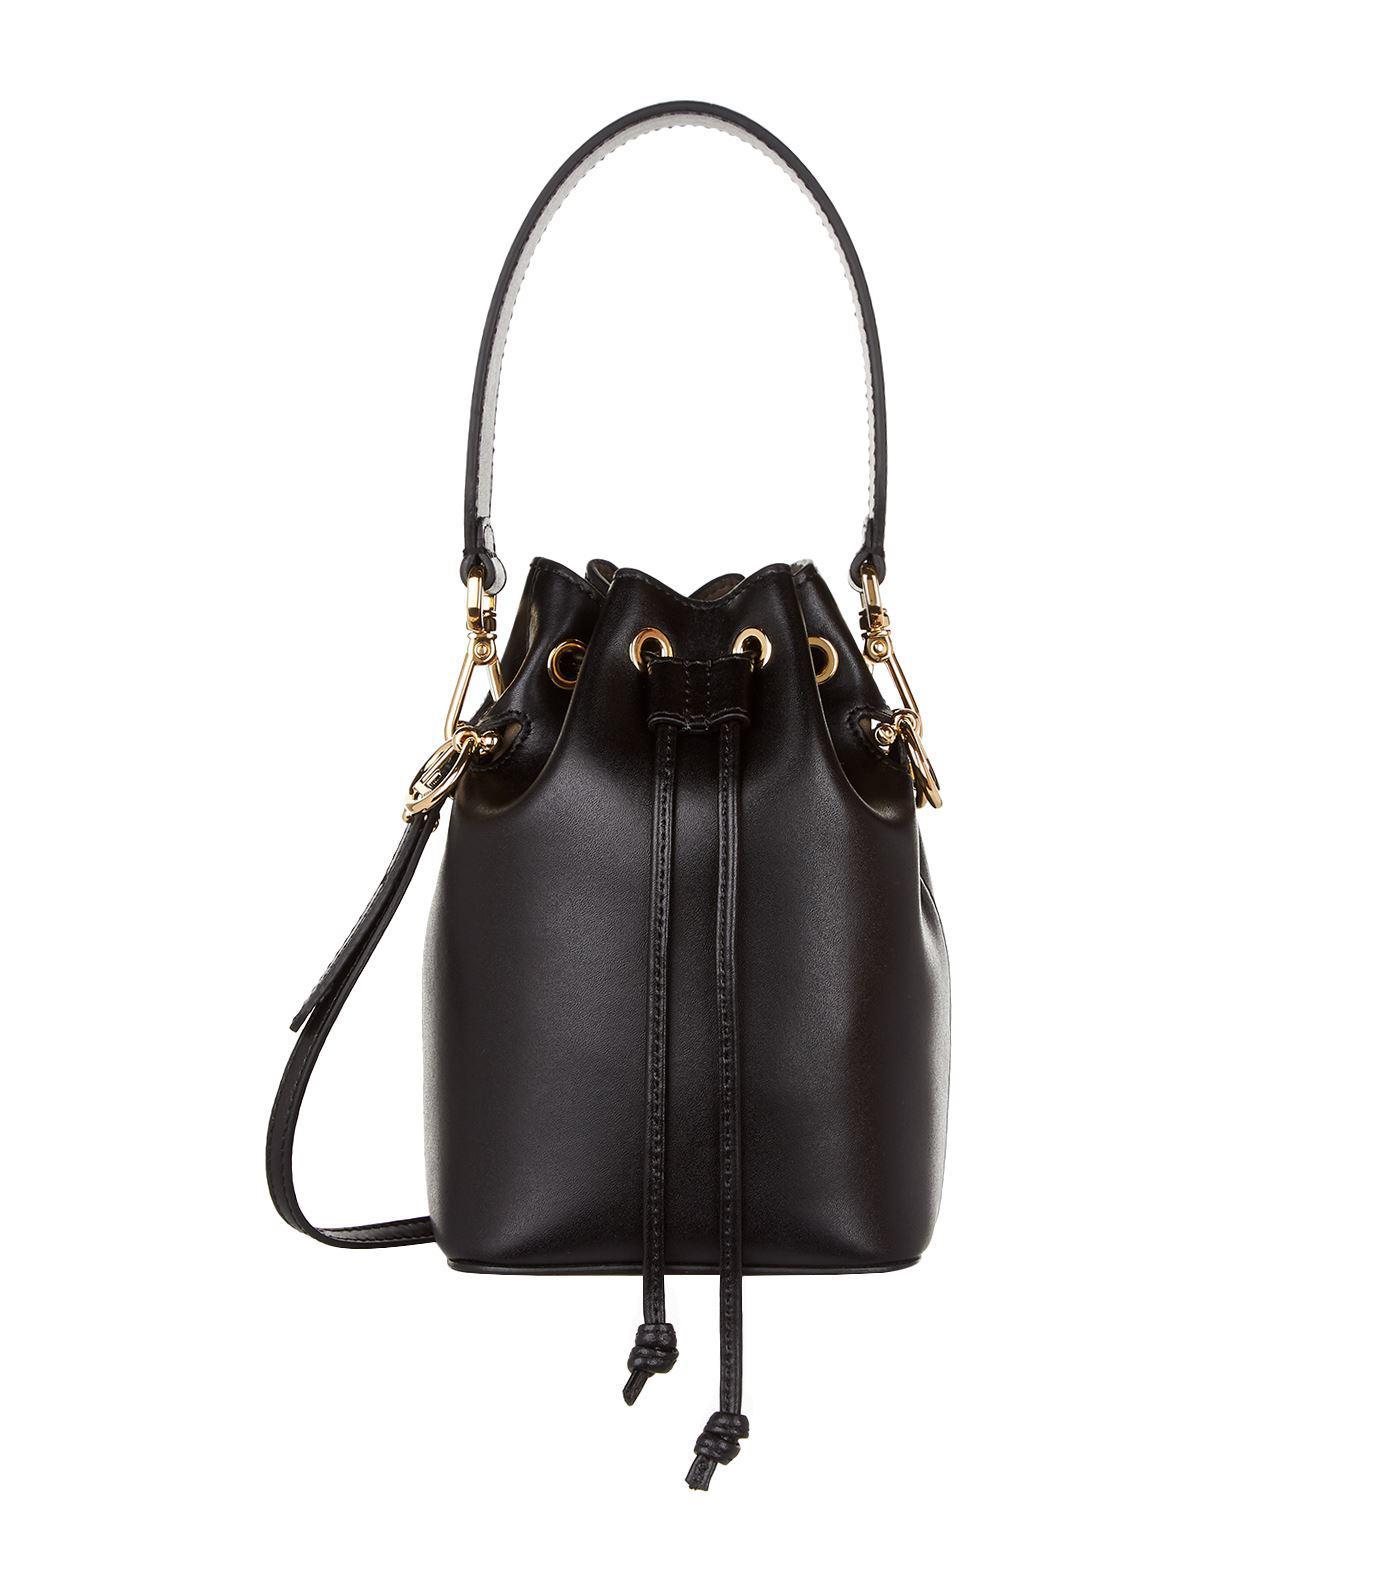 9220fd4fc2 Fendi Mini Mon Tresor Leather Bucket Bag in Black - Save 10% - Lyst